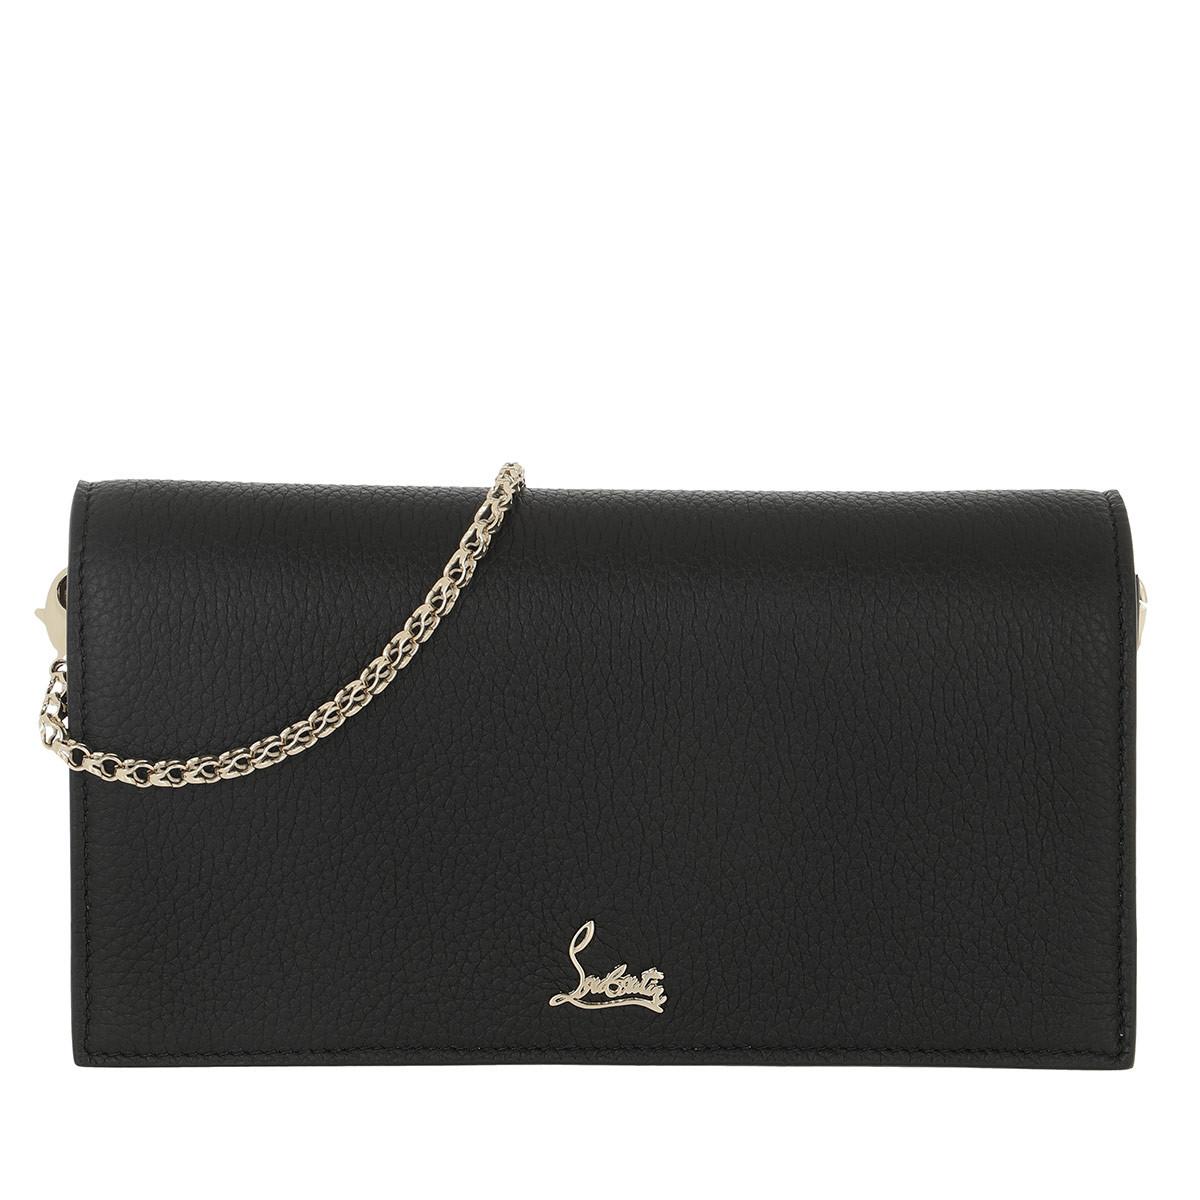 Christian Louboutin Gürteltasche - Boudoir Chain Belt Bag Leather Black - in schwarz - für Damen